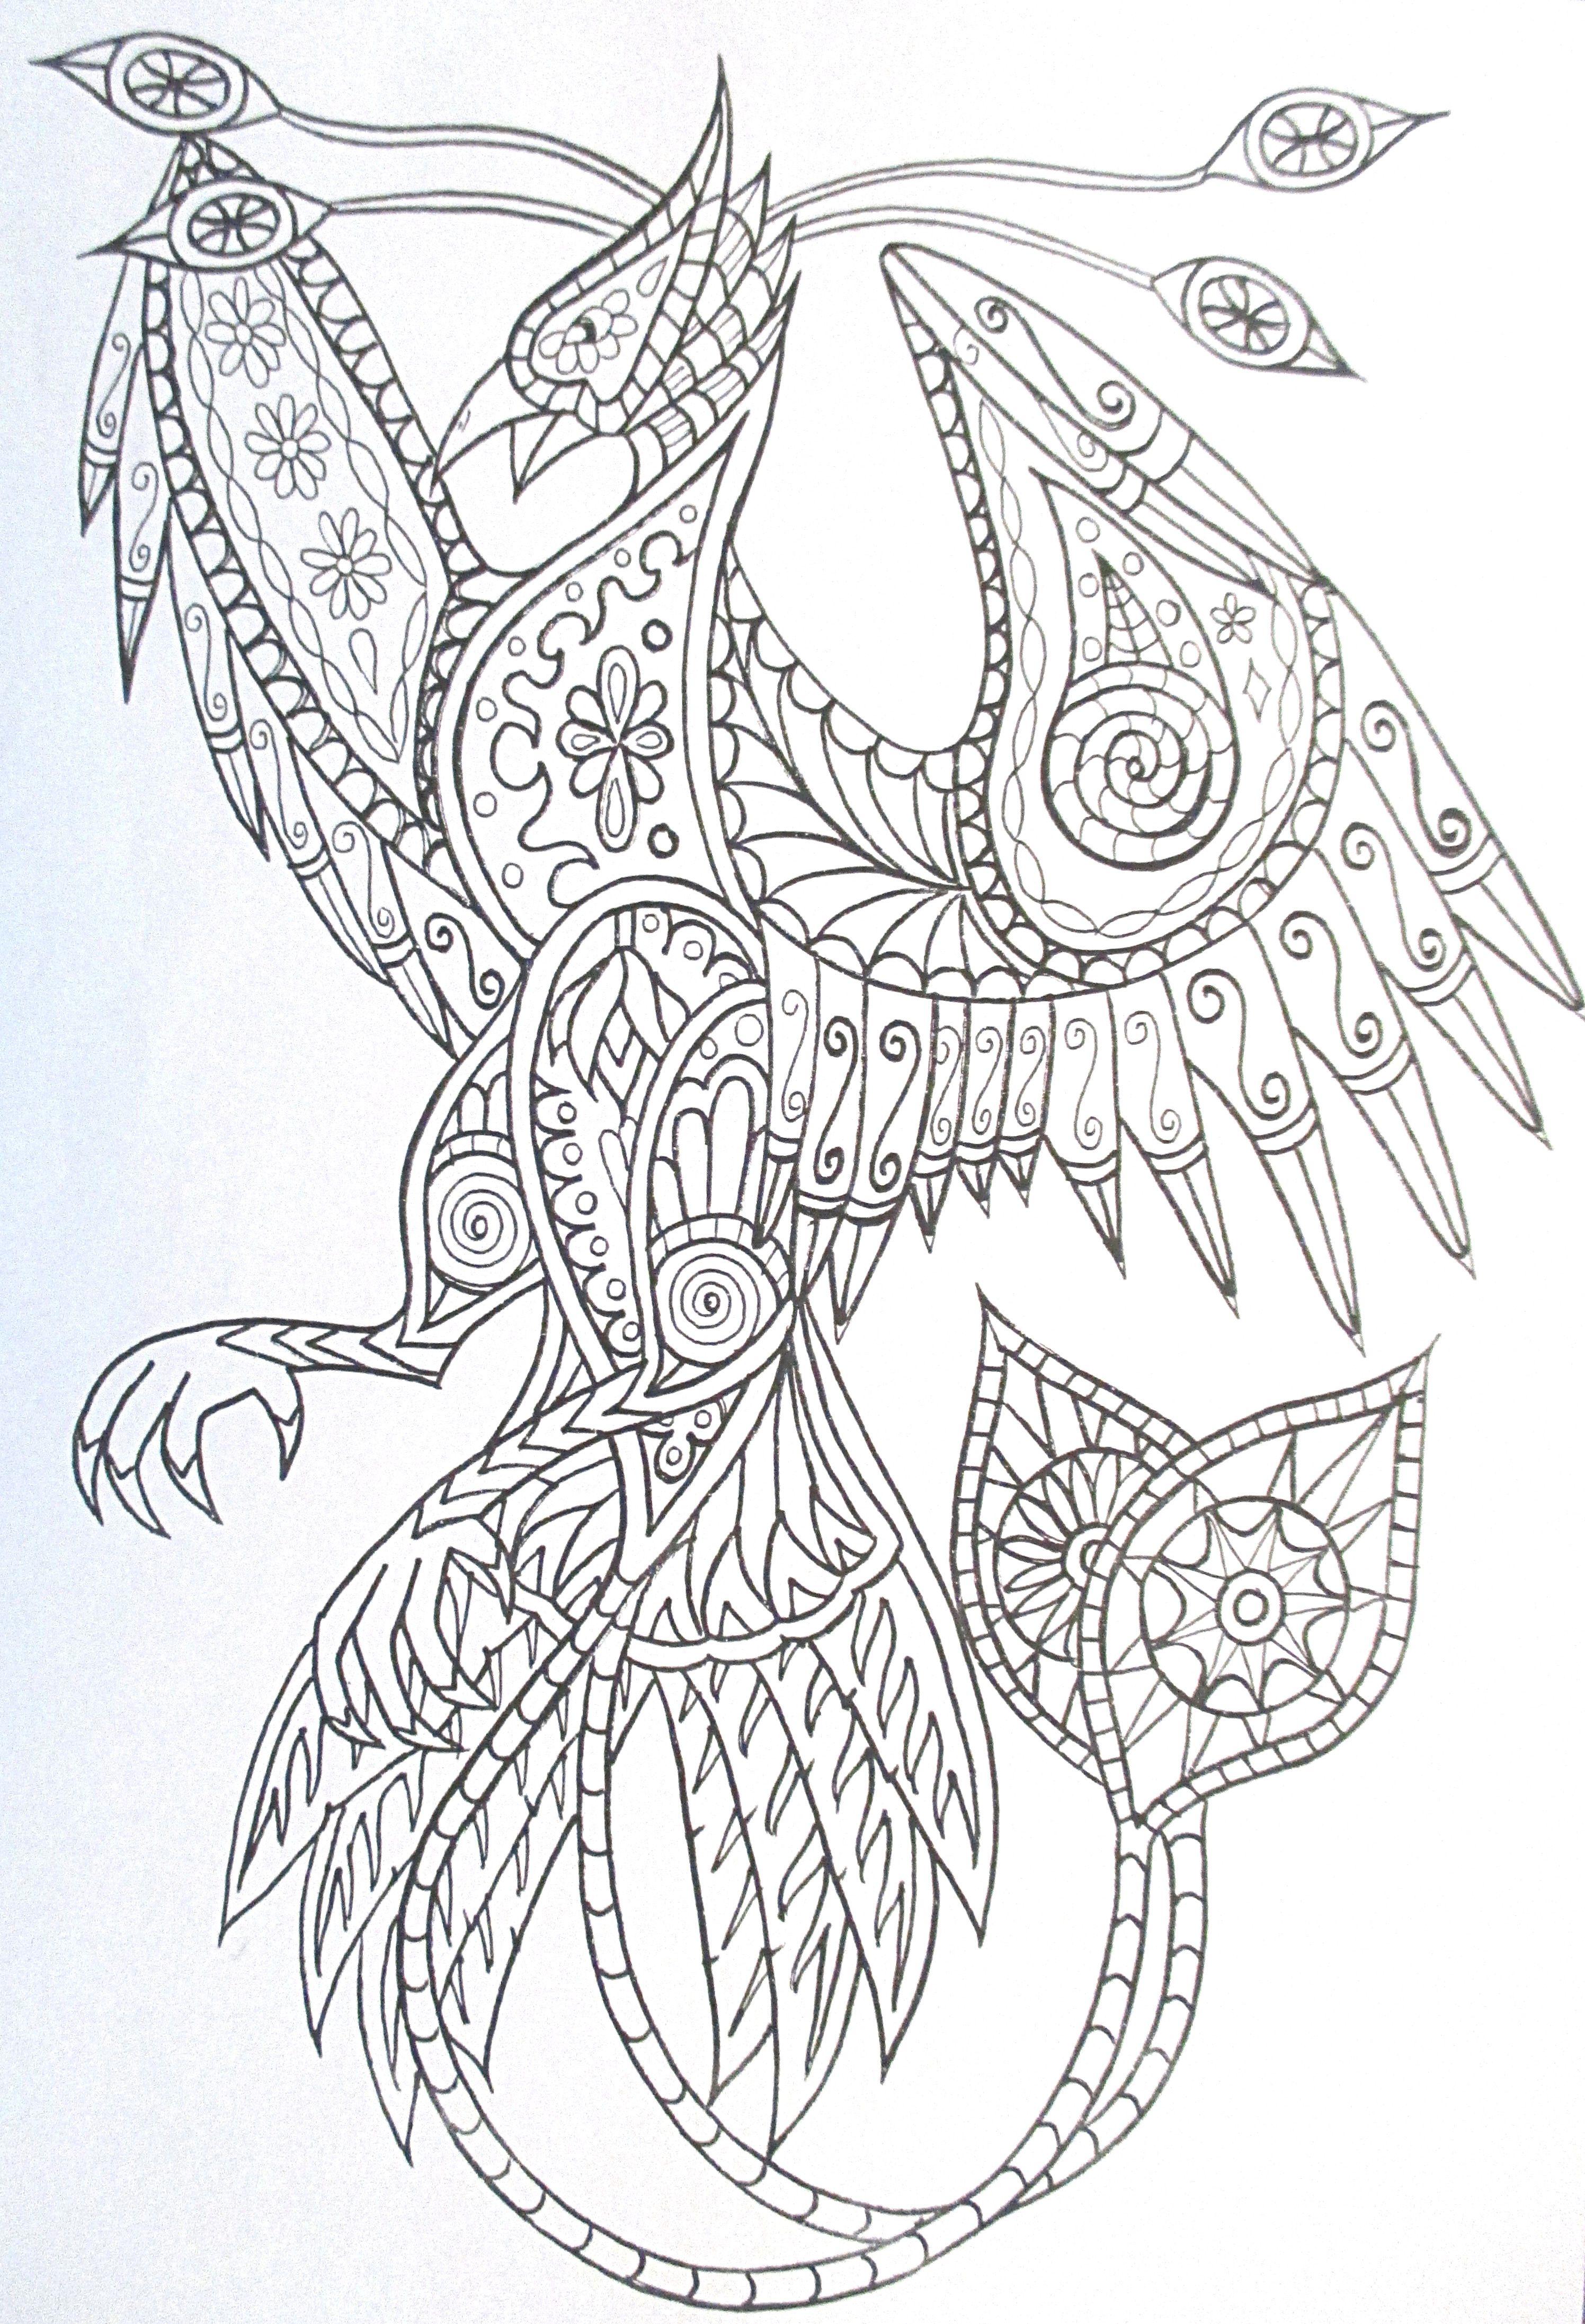 Steampunk phoenix coloring page printable adult Kleuren